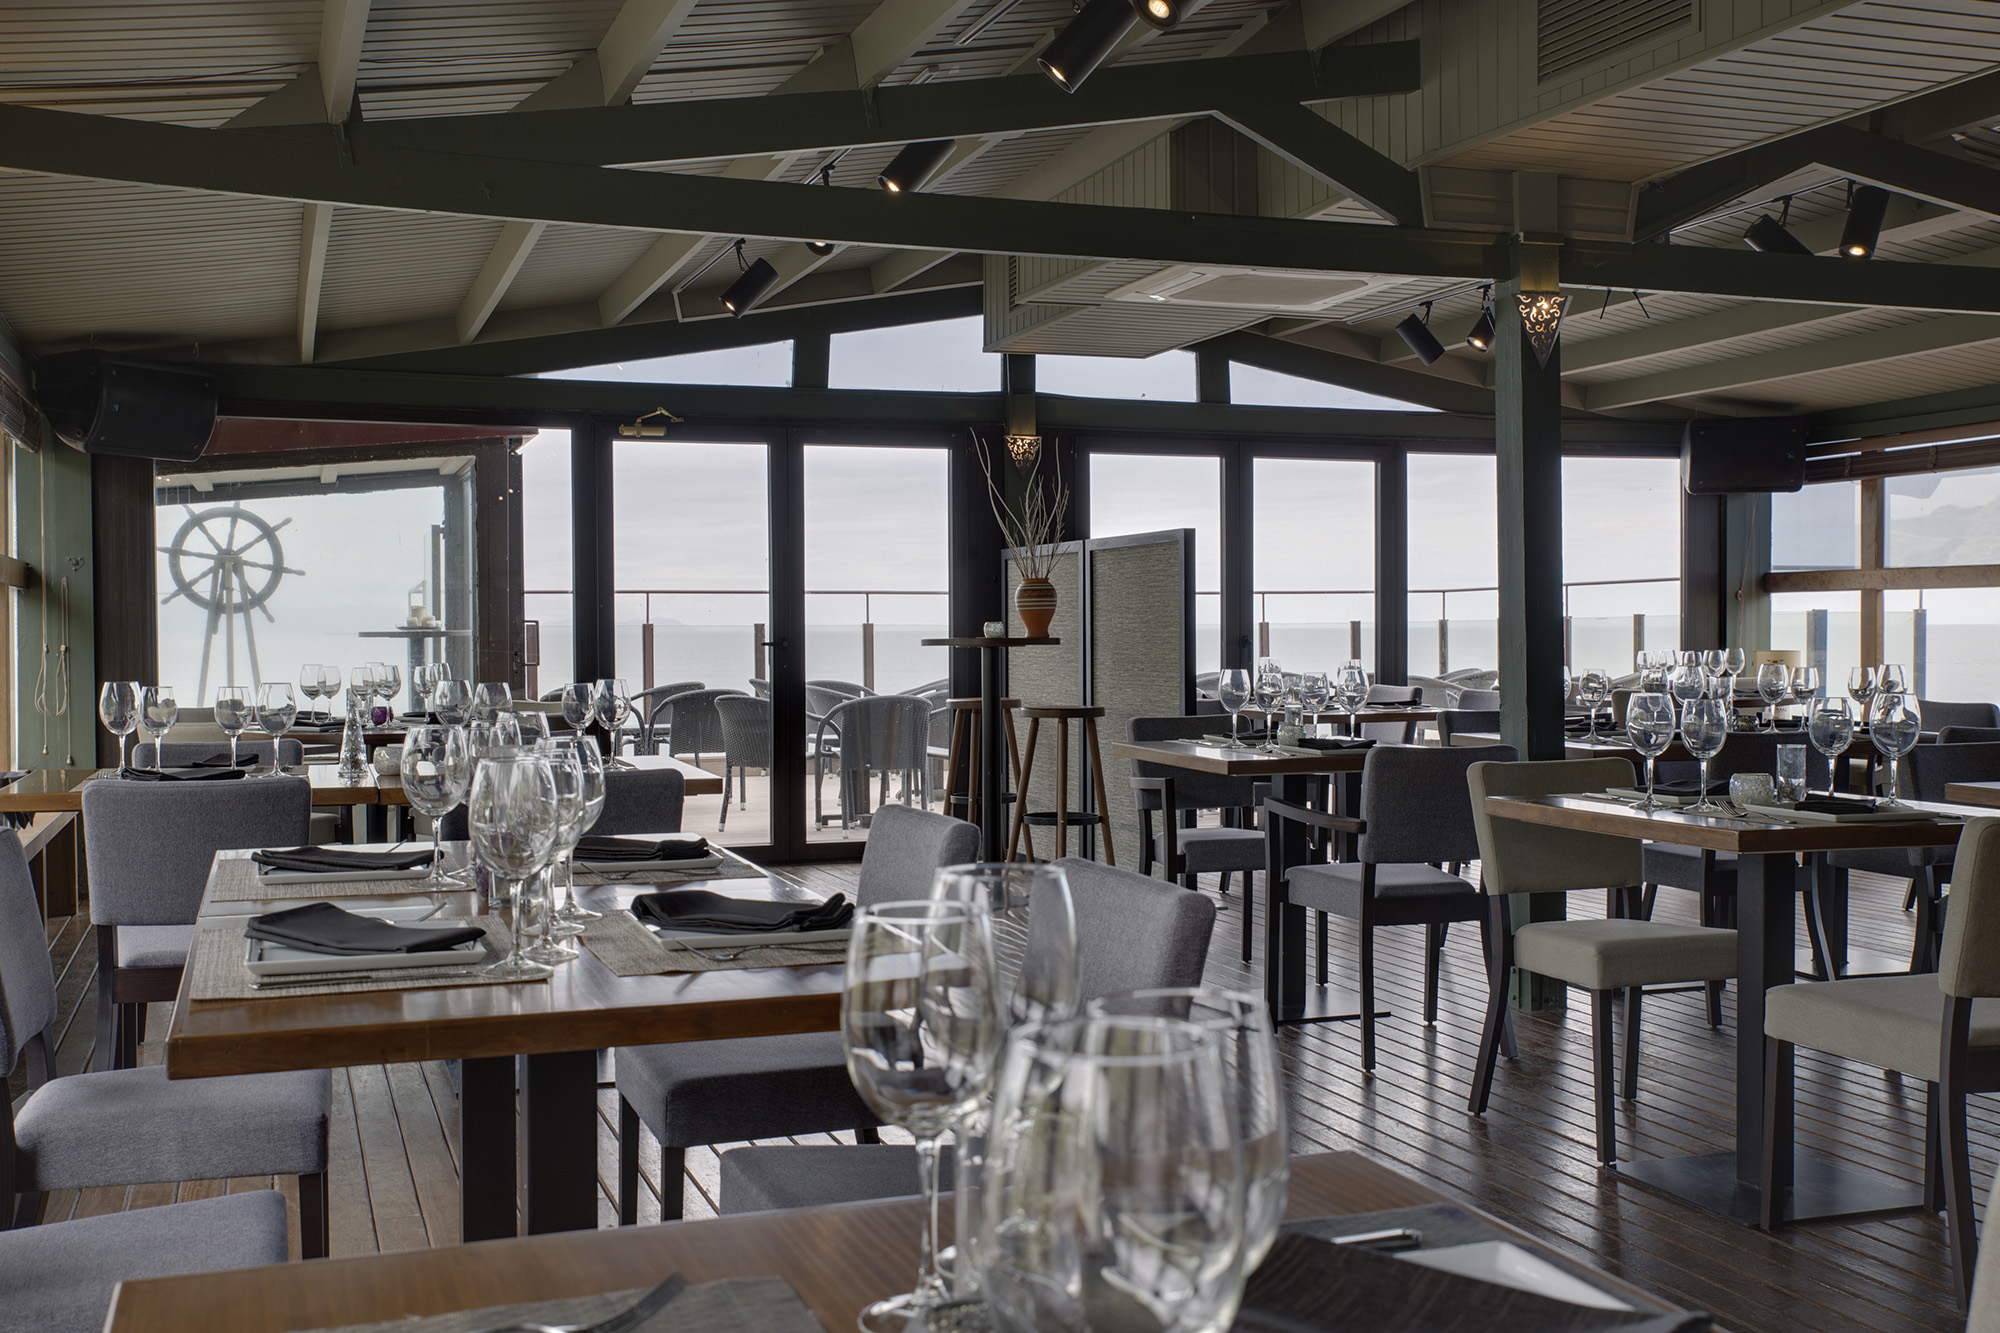 El pe n de sopelana bar terraza celebraci n eventos - Restaurante gardoki sopelana ...